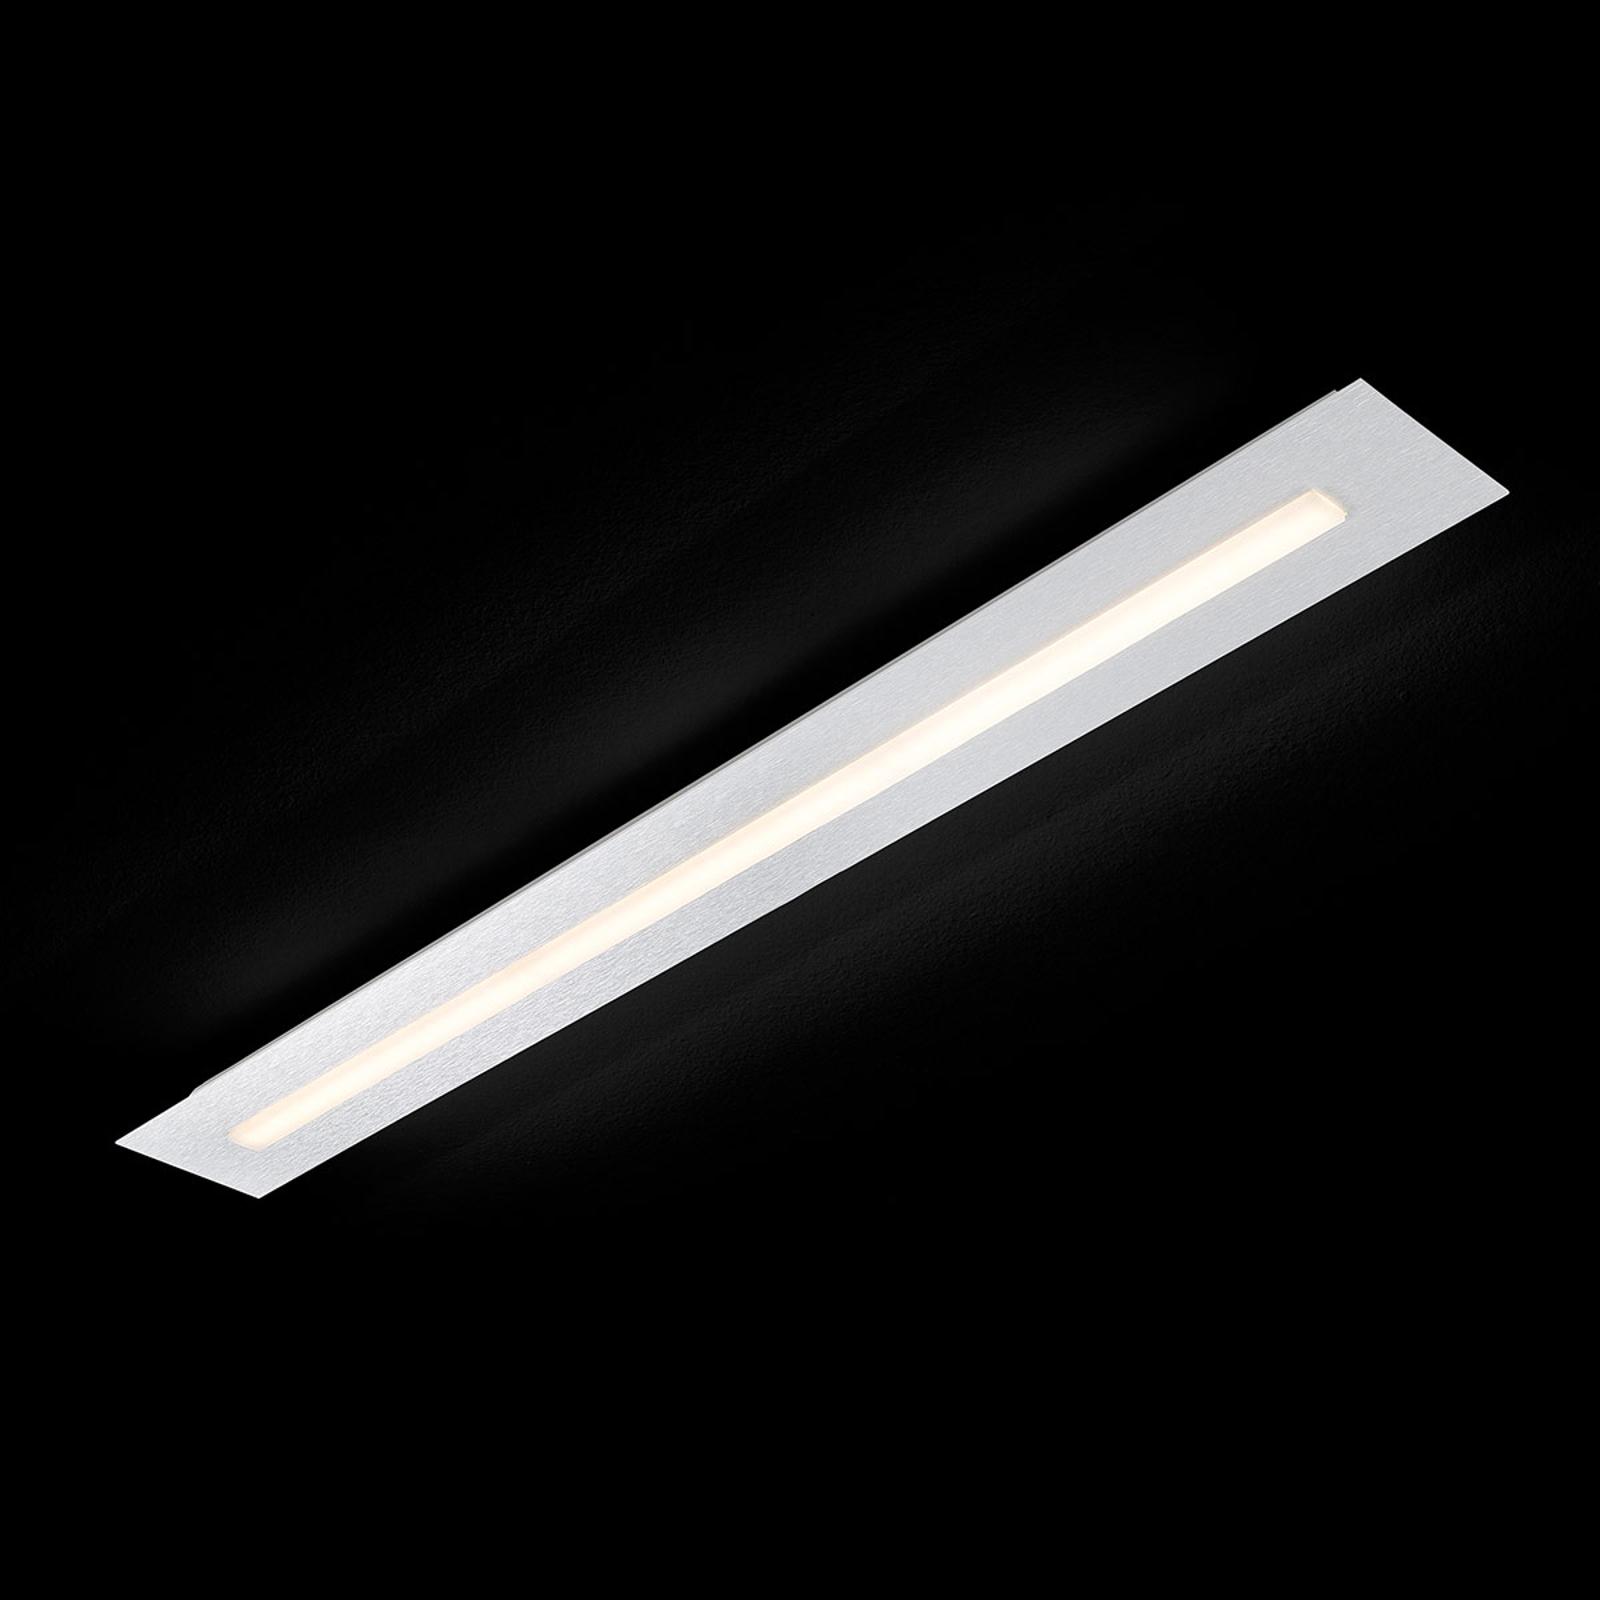 GROSSMANN Fis lampa sufitowa LED, 80,5 cm